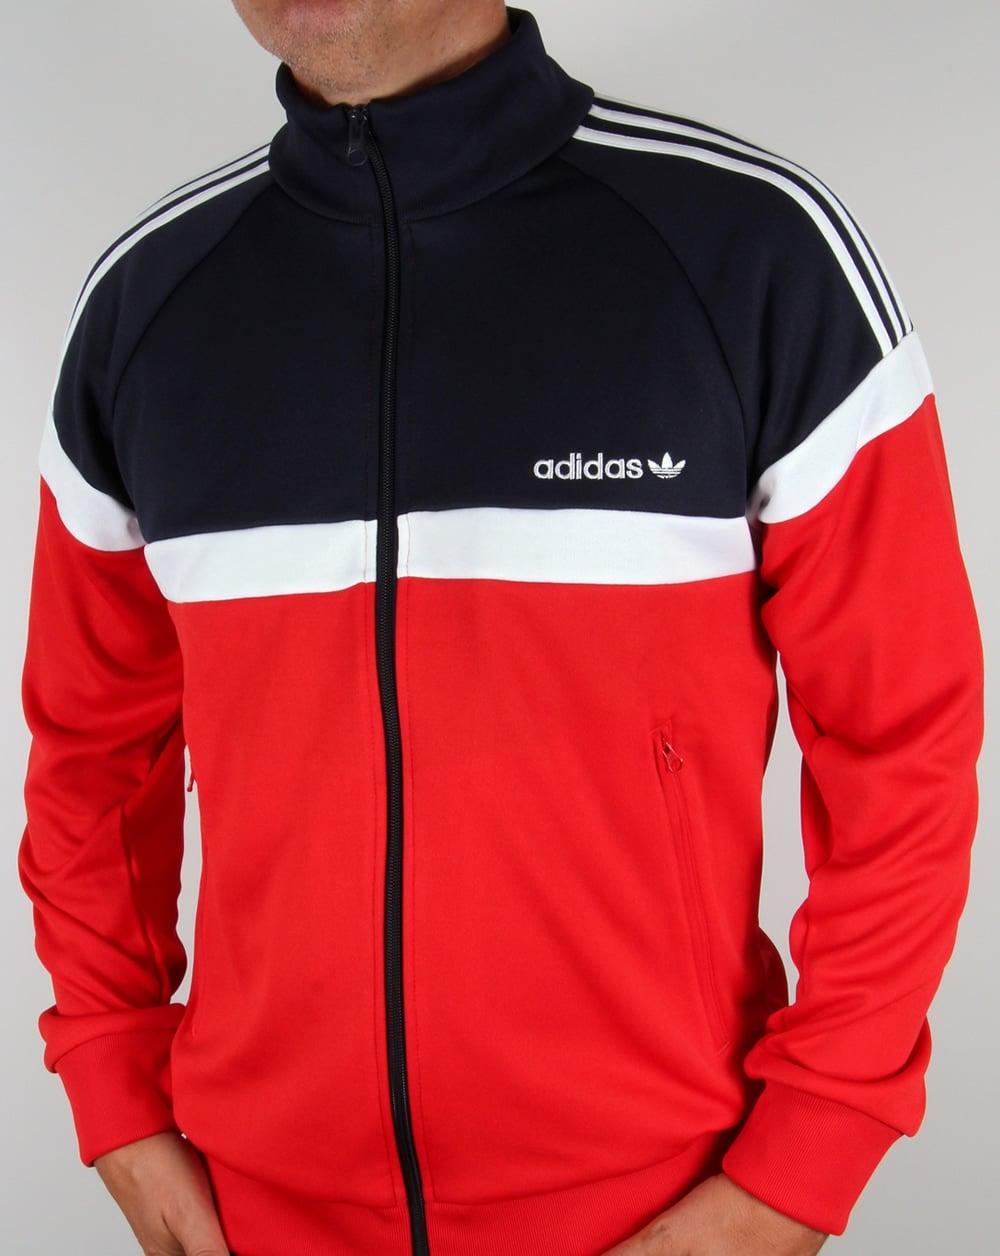 Adidas Originals Itasca Track Top Red Navy Jacket Tracksuit